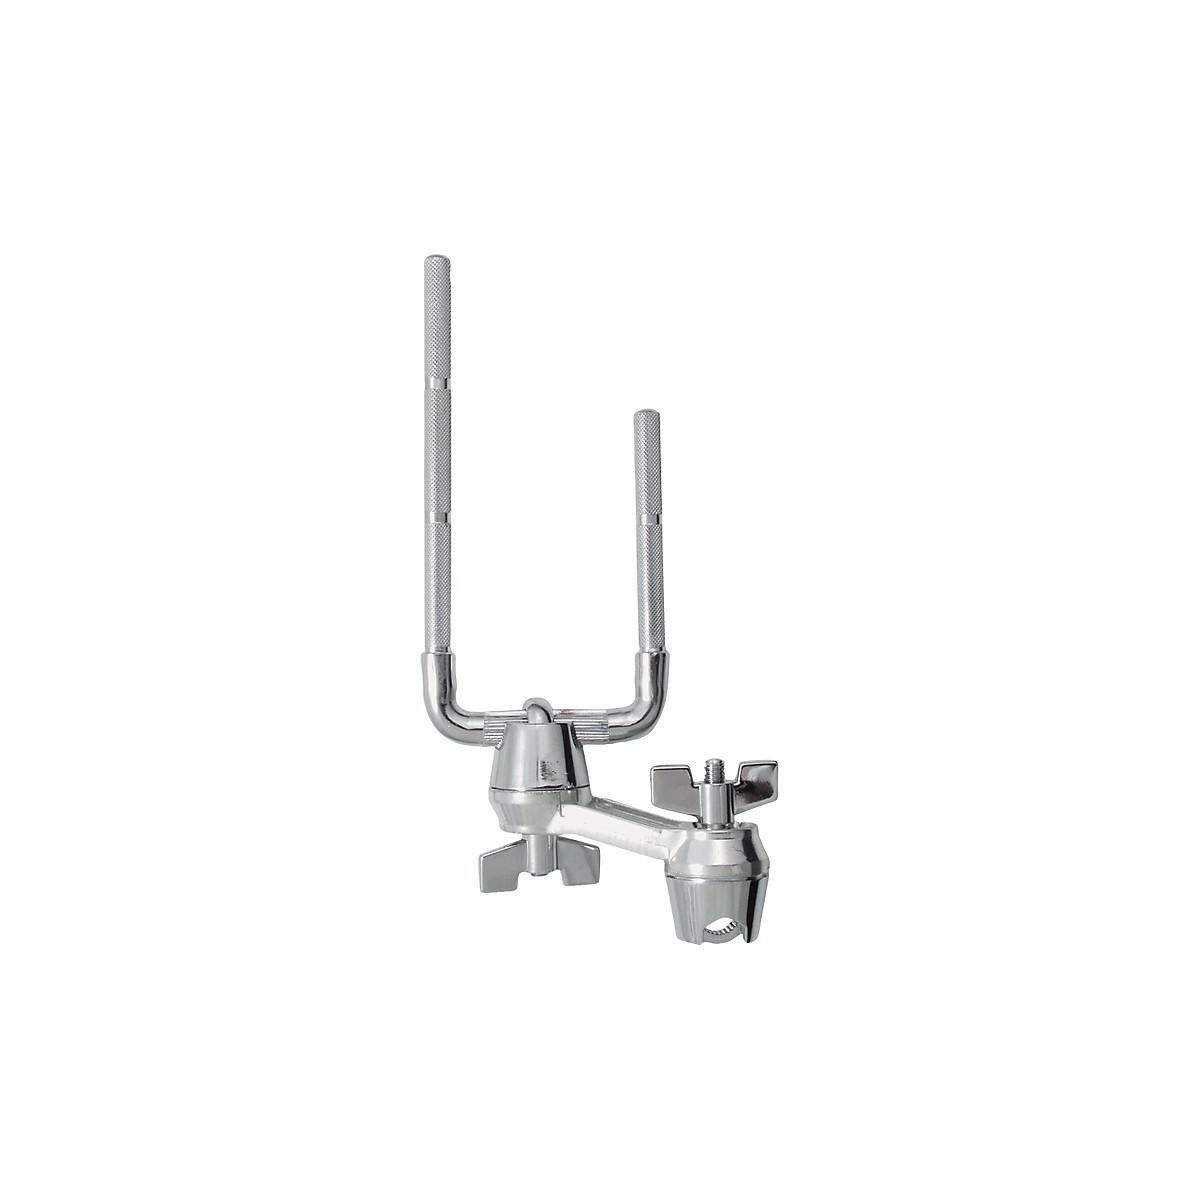 Gibraltar Dual-Post L-Rod Adjustment Clamp